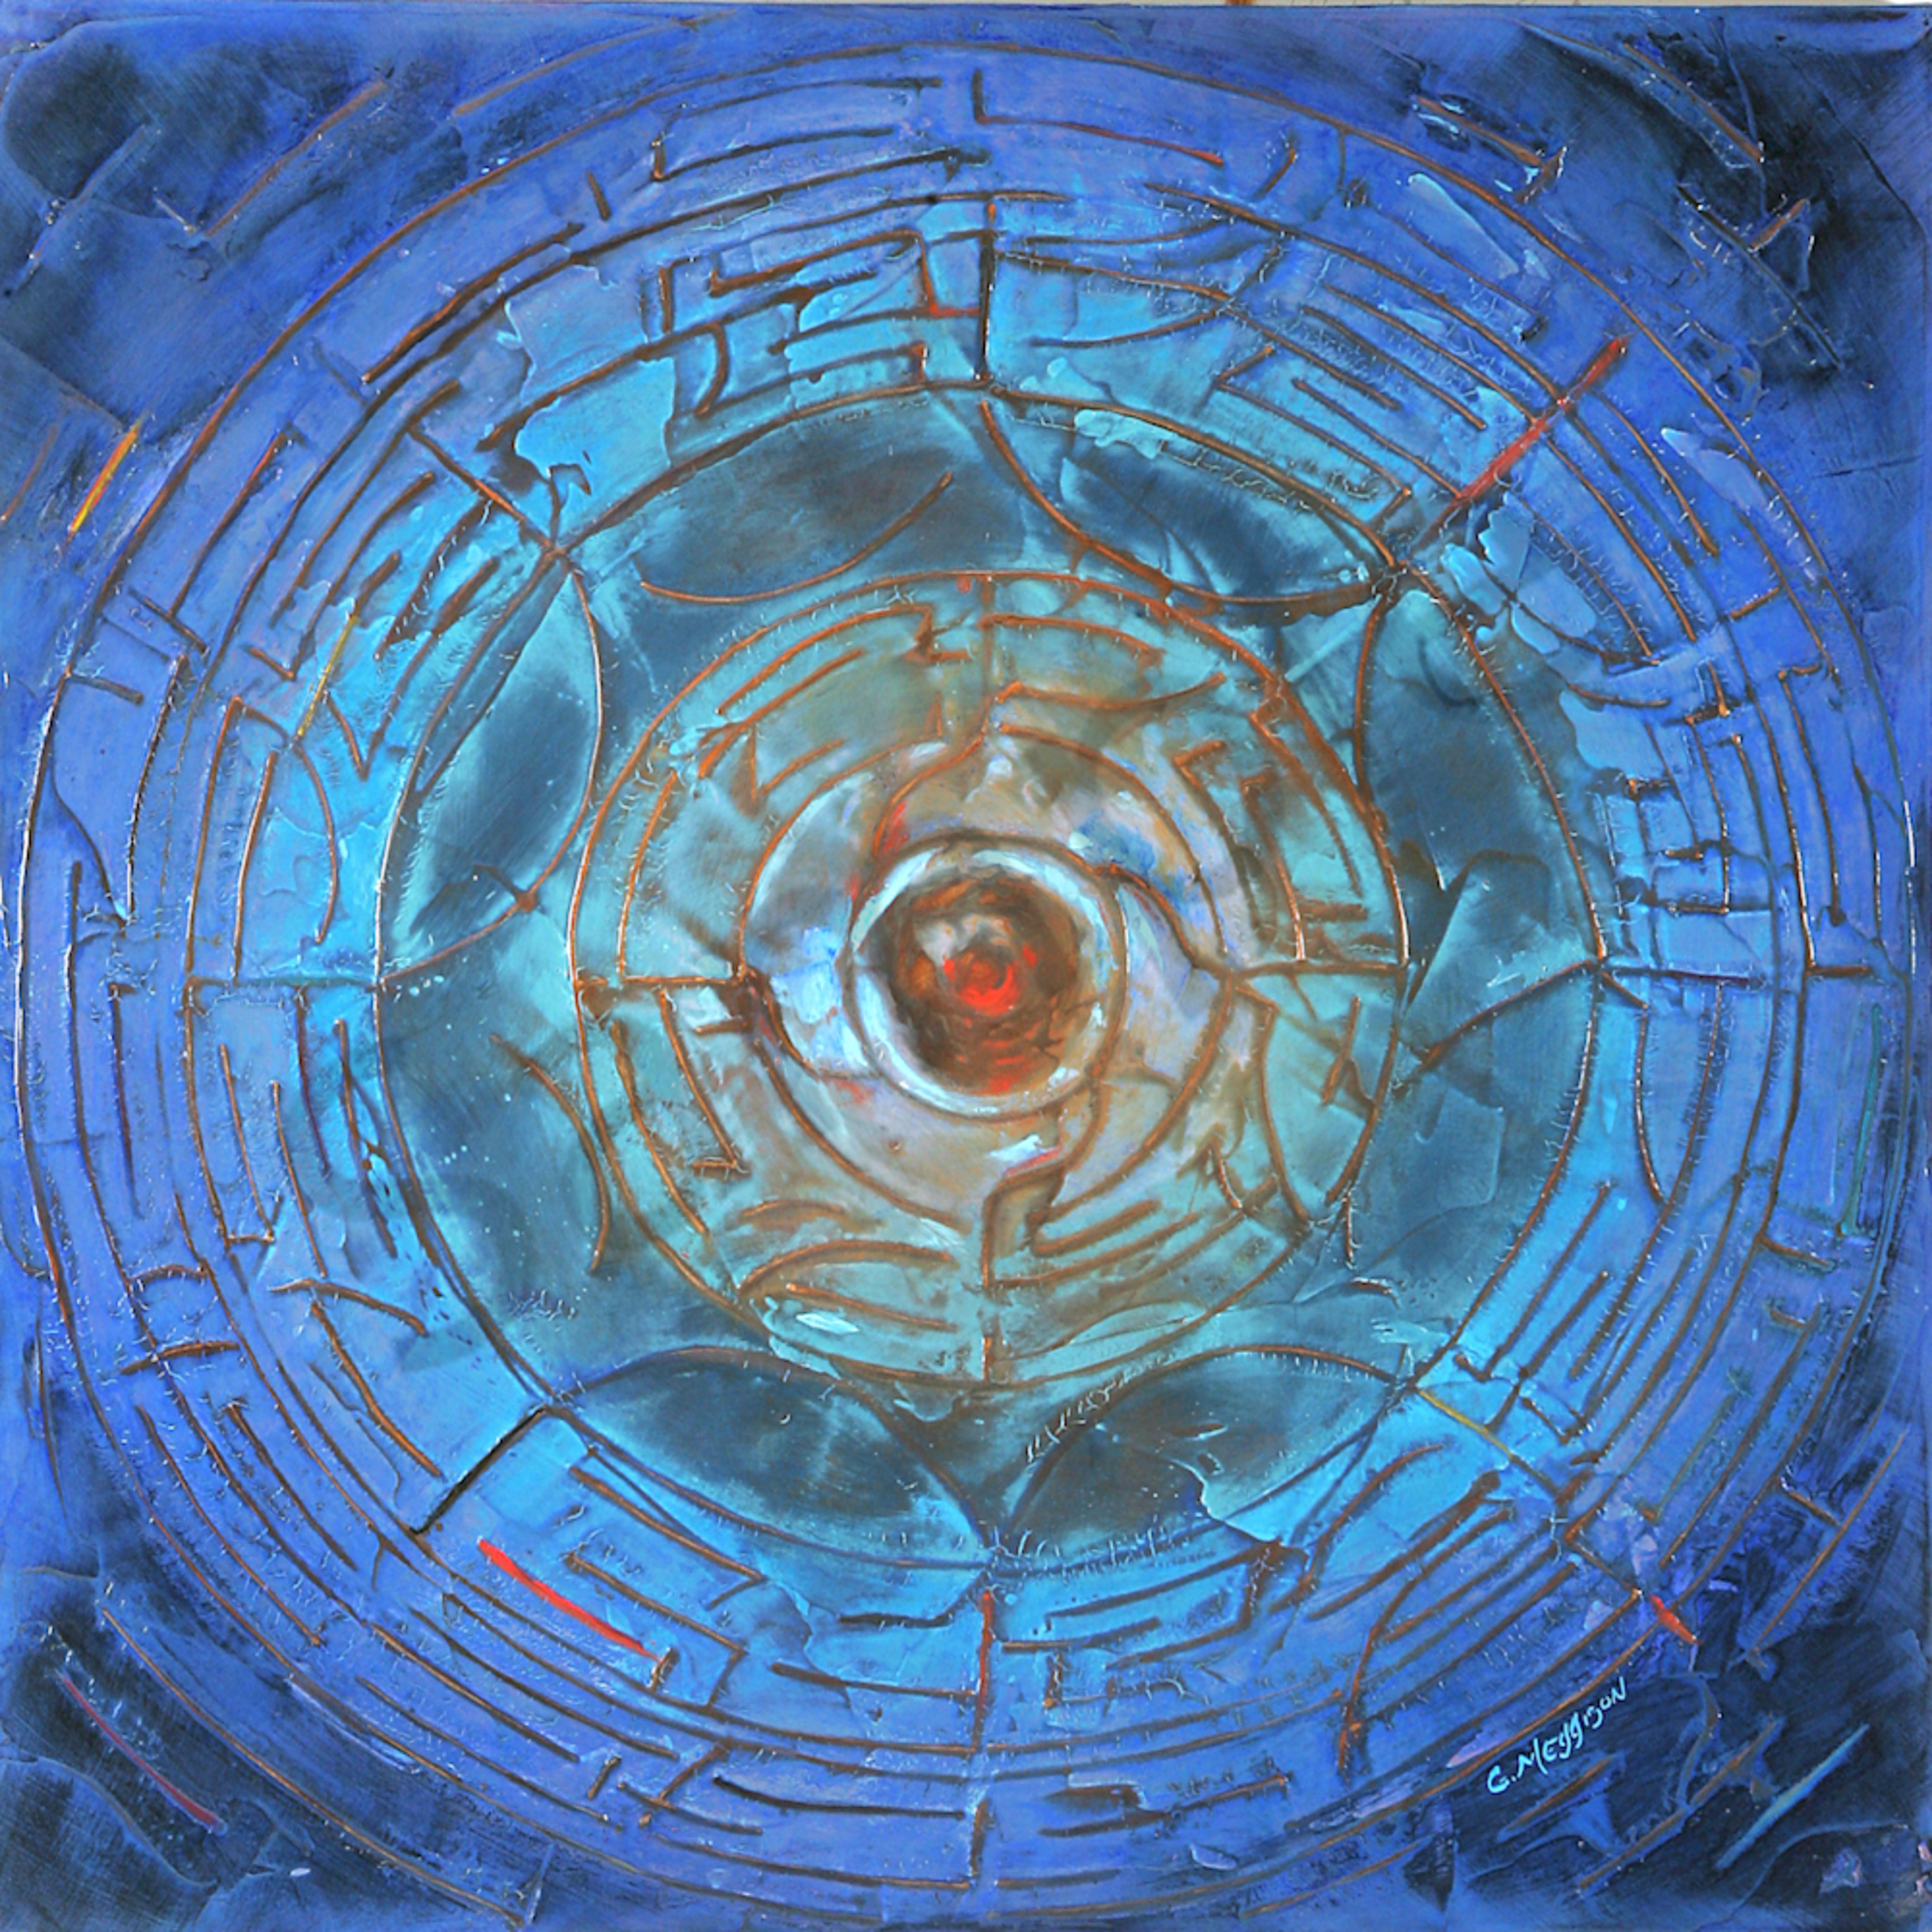 Wheel of life 36 x36 acryl mixd med g. meggison iv qub56v